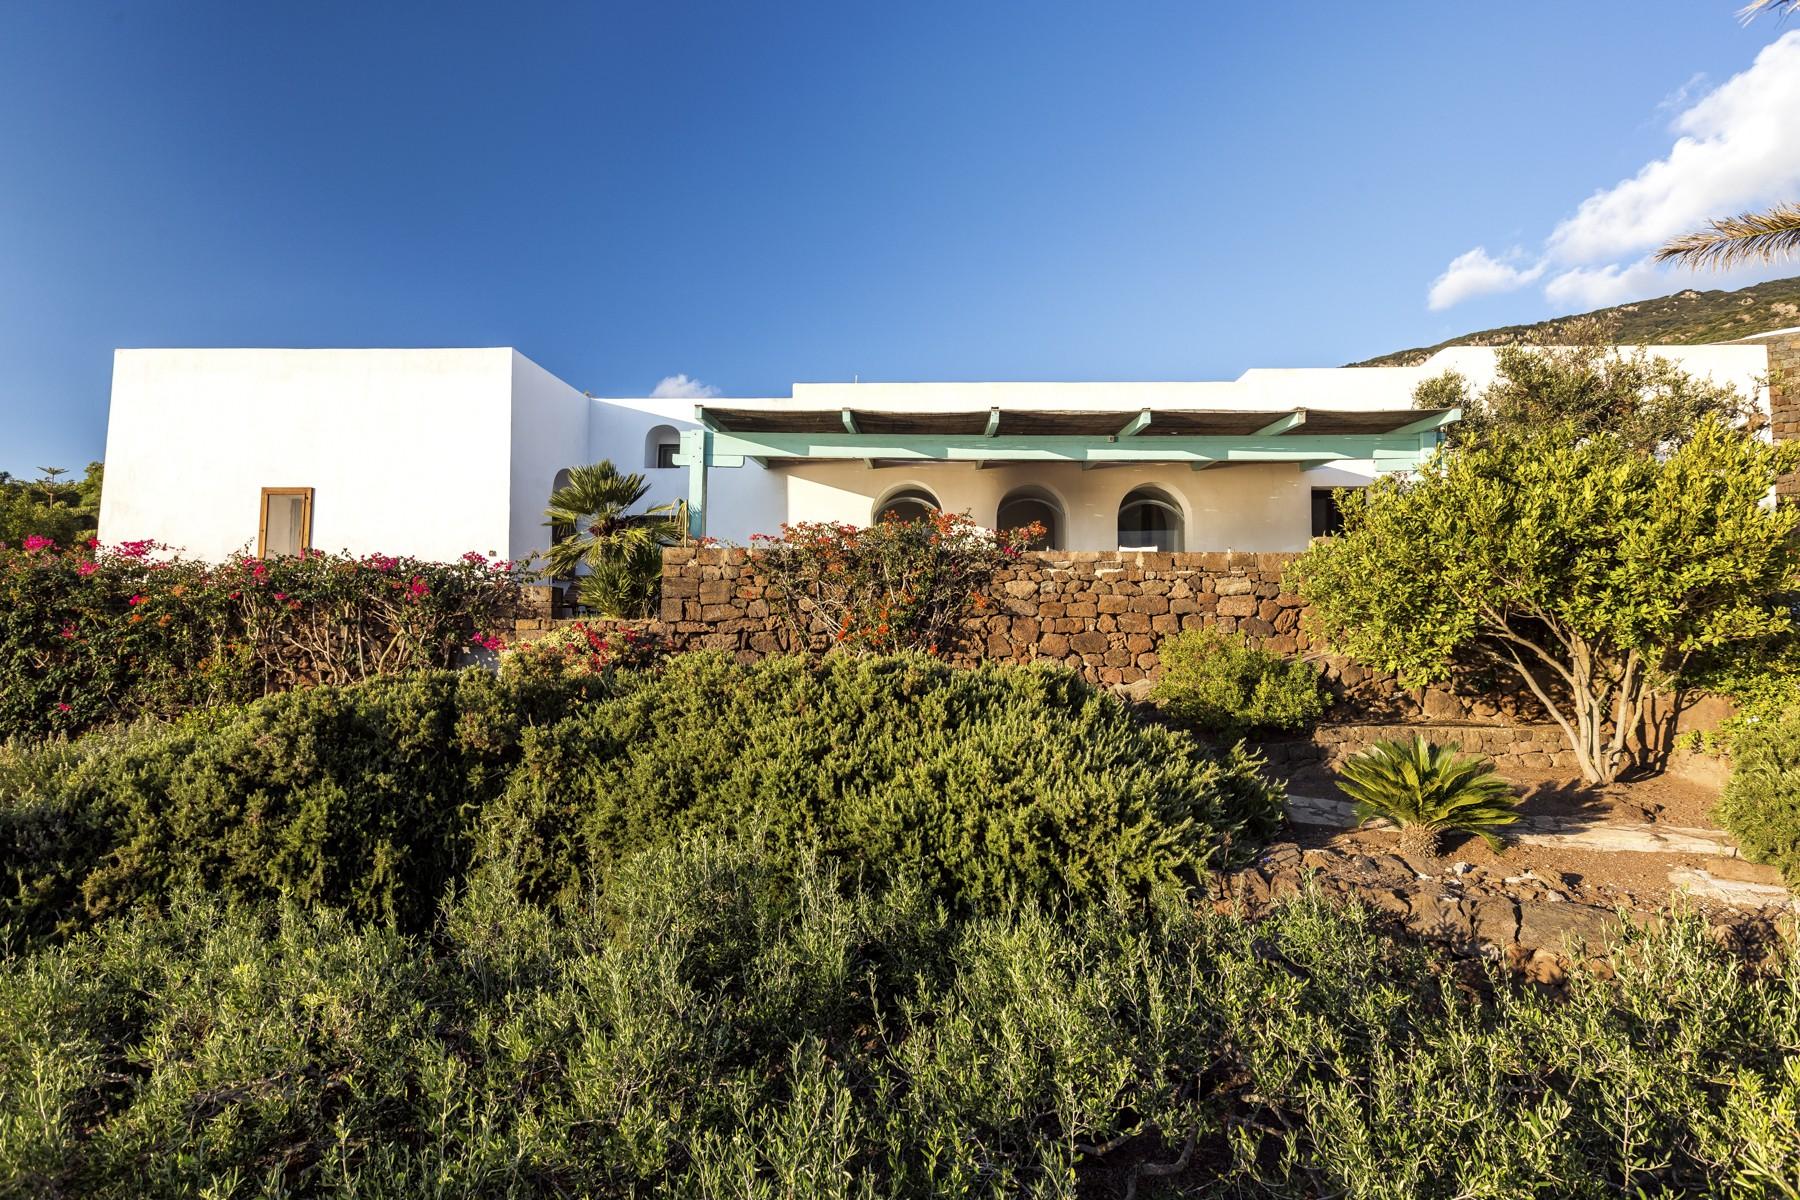 Villa in Vendita a Pantelleria: 5 locali, 530 mq - Foto 25